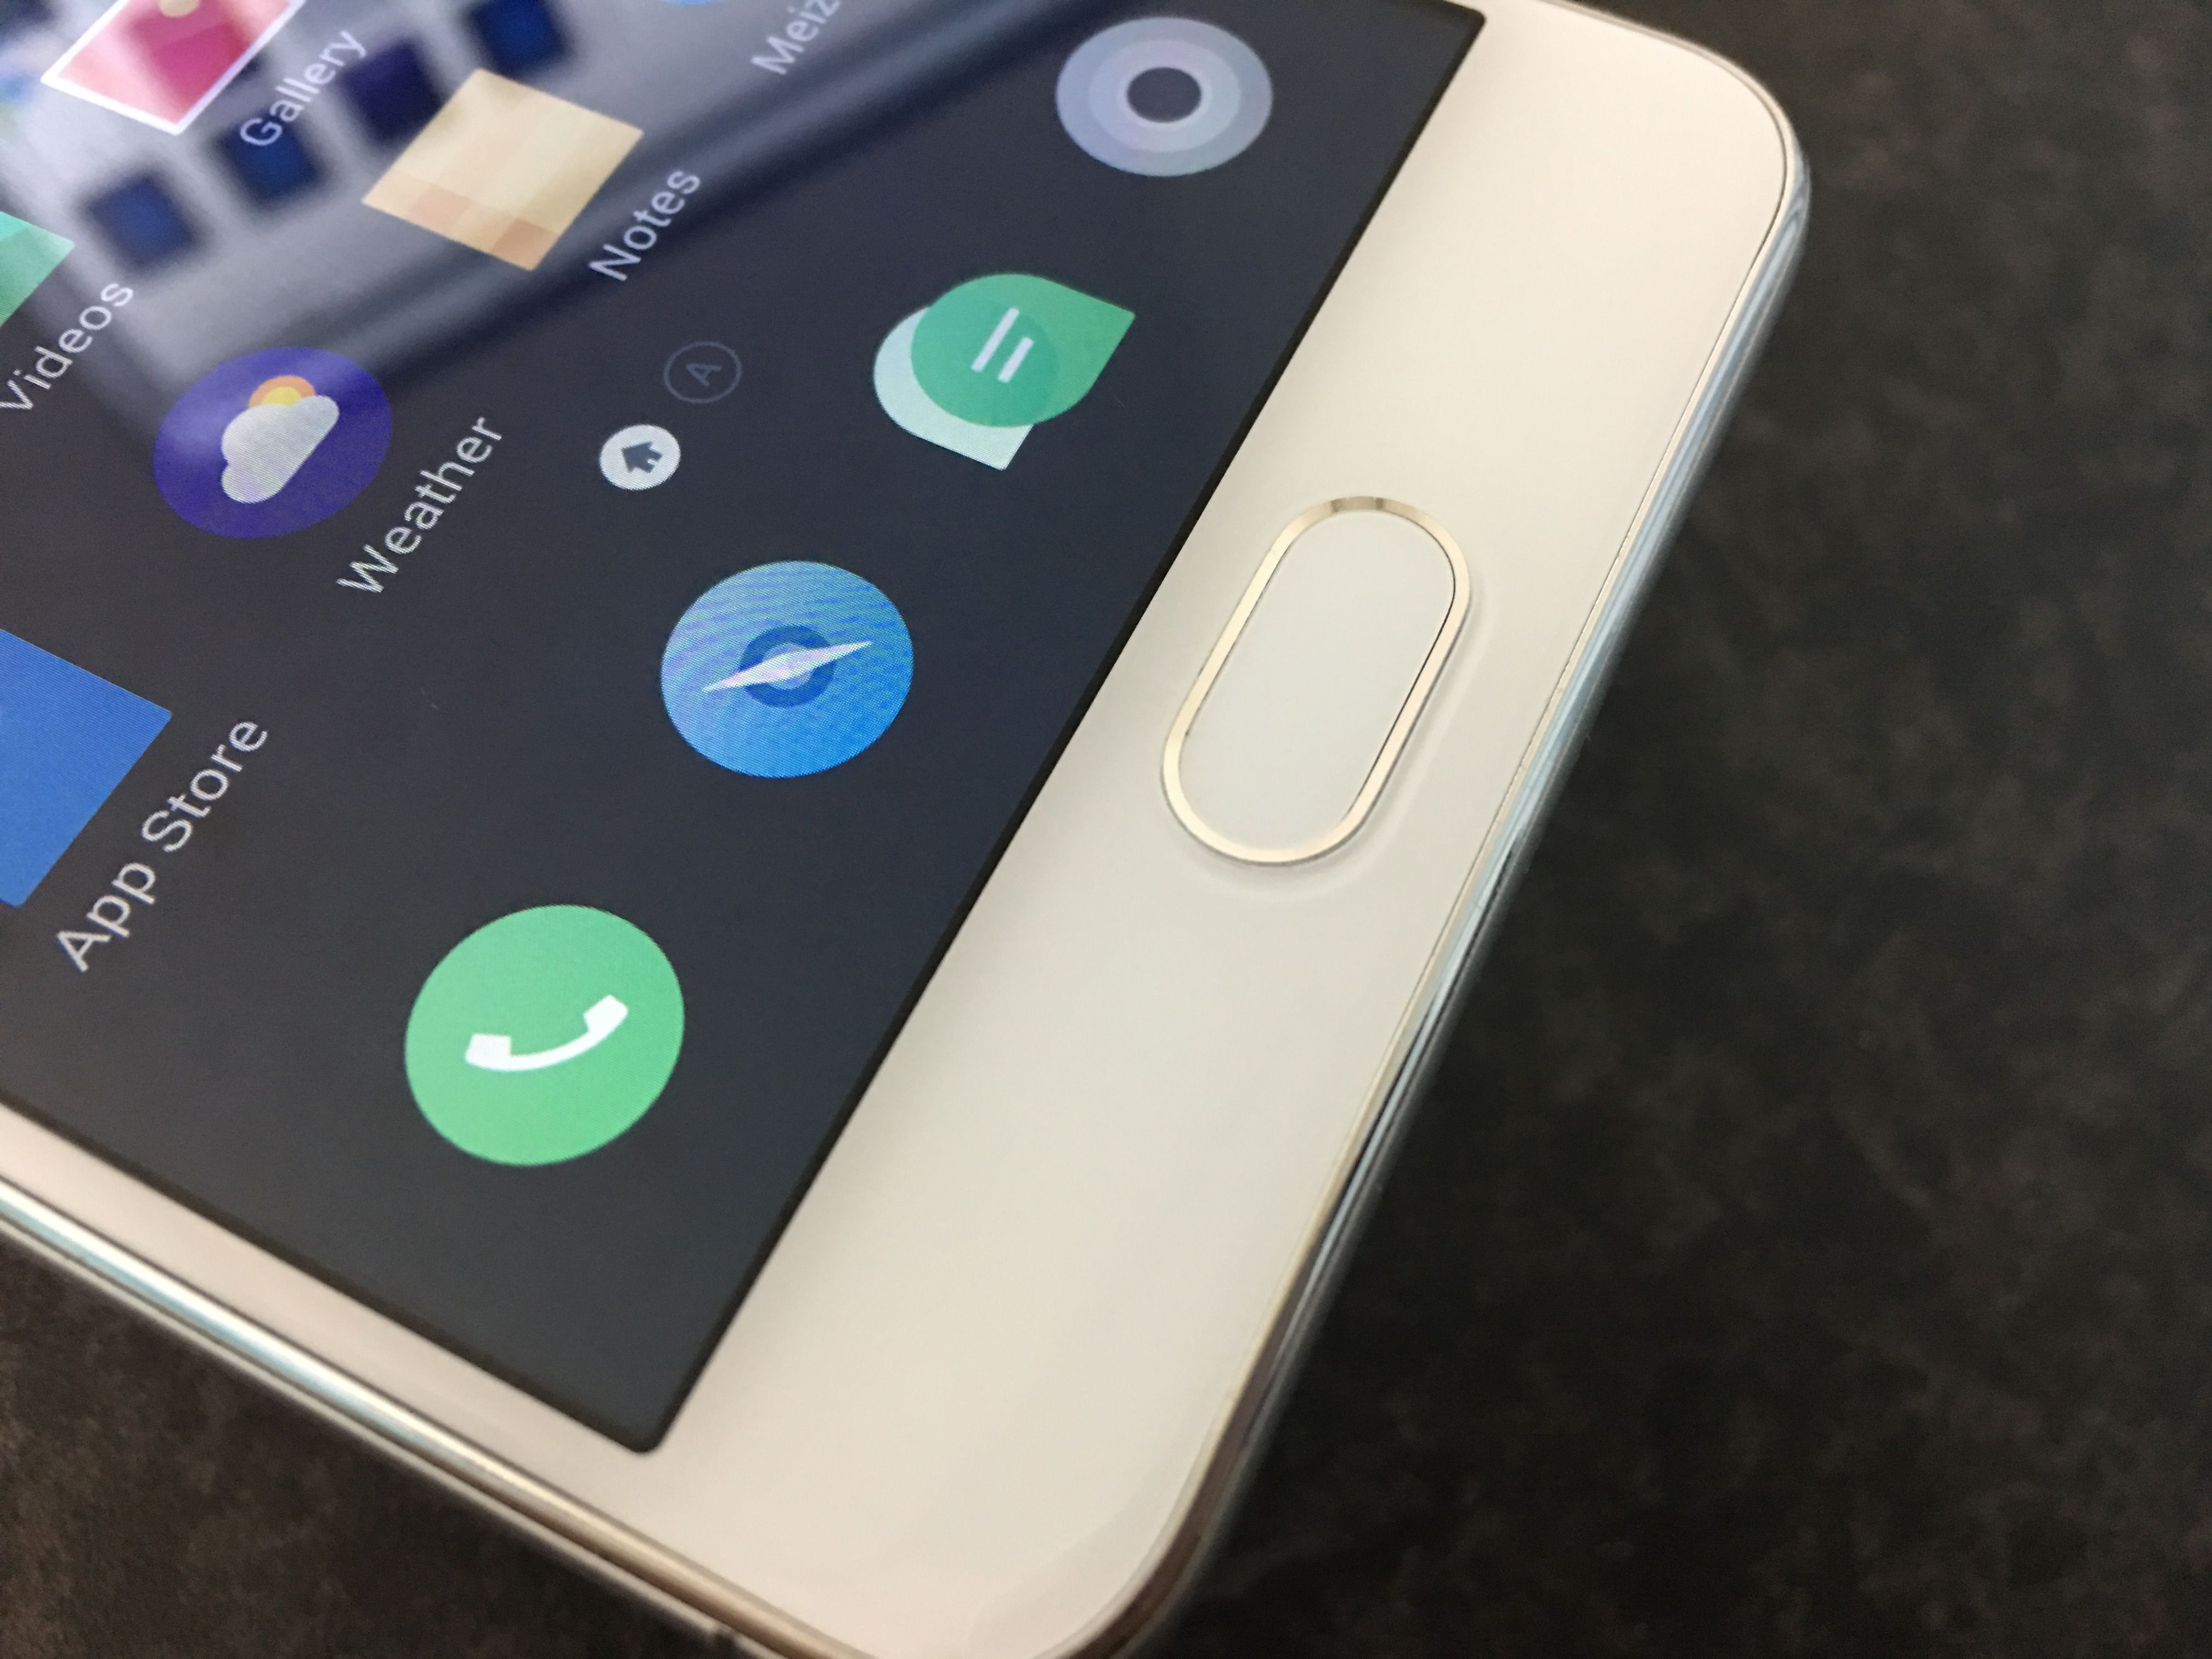 Meizu、Qualcomm製SoC「Snapdragon」は年末採用予定。副総裁の李楠 氏が明かす。